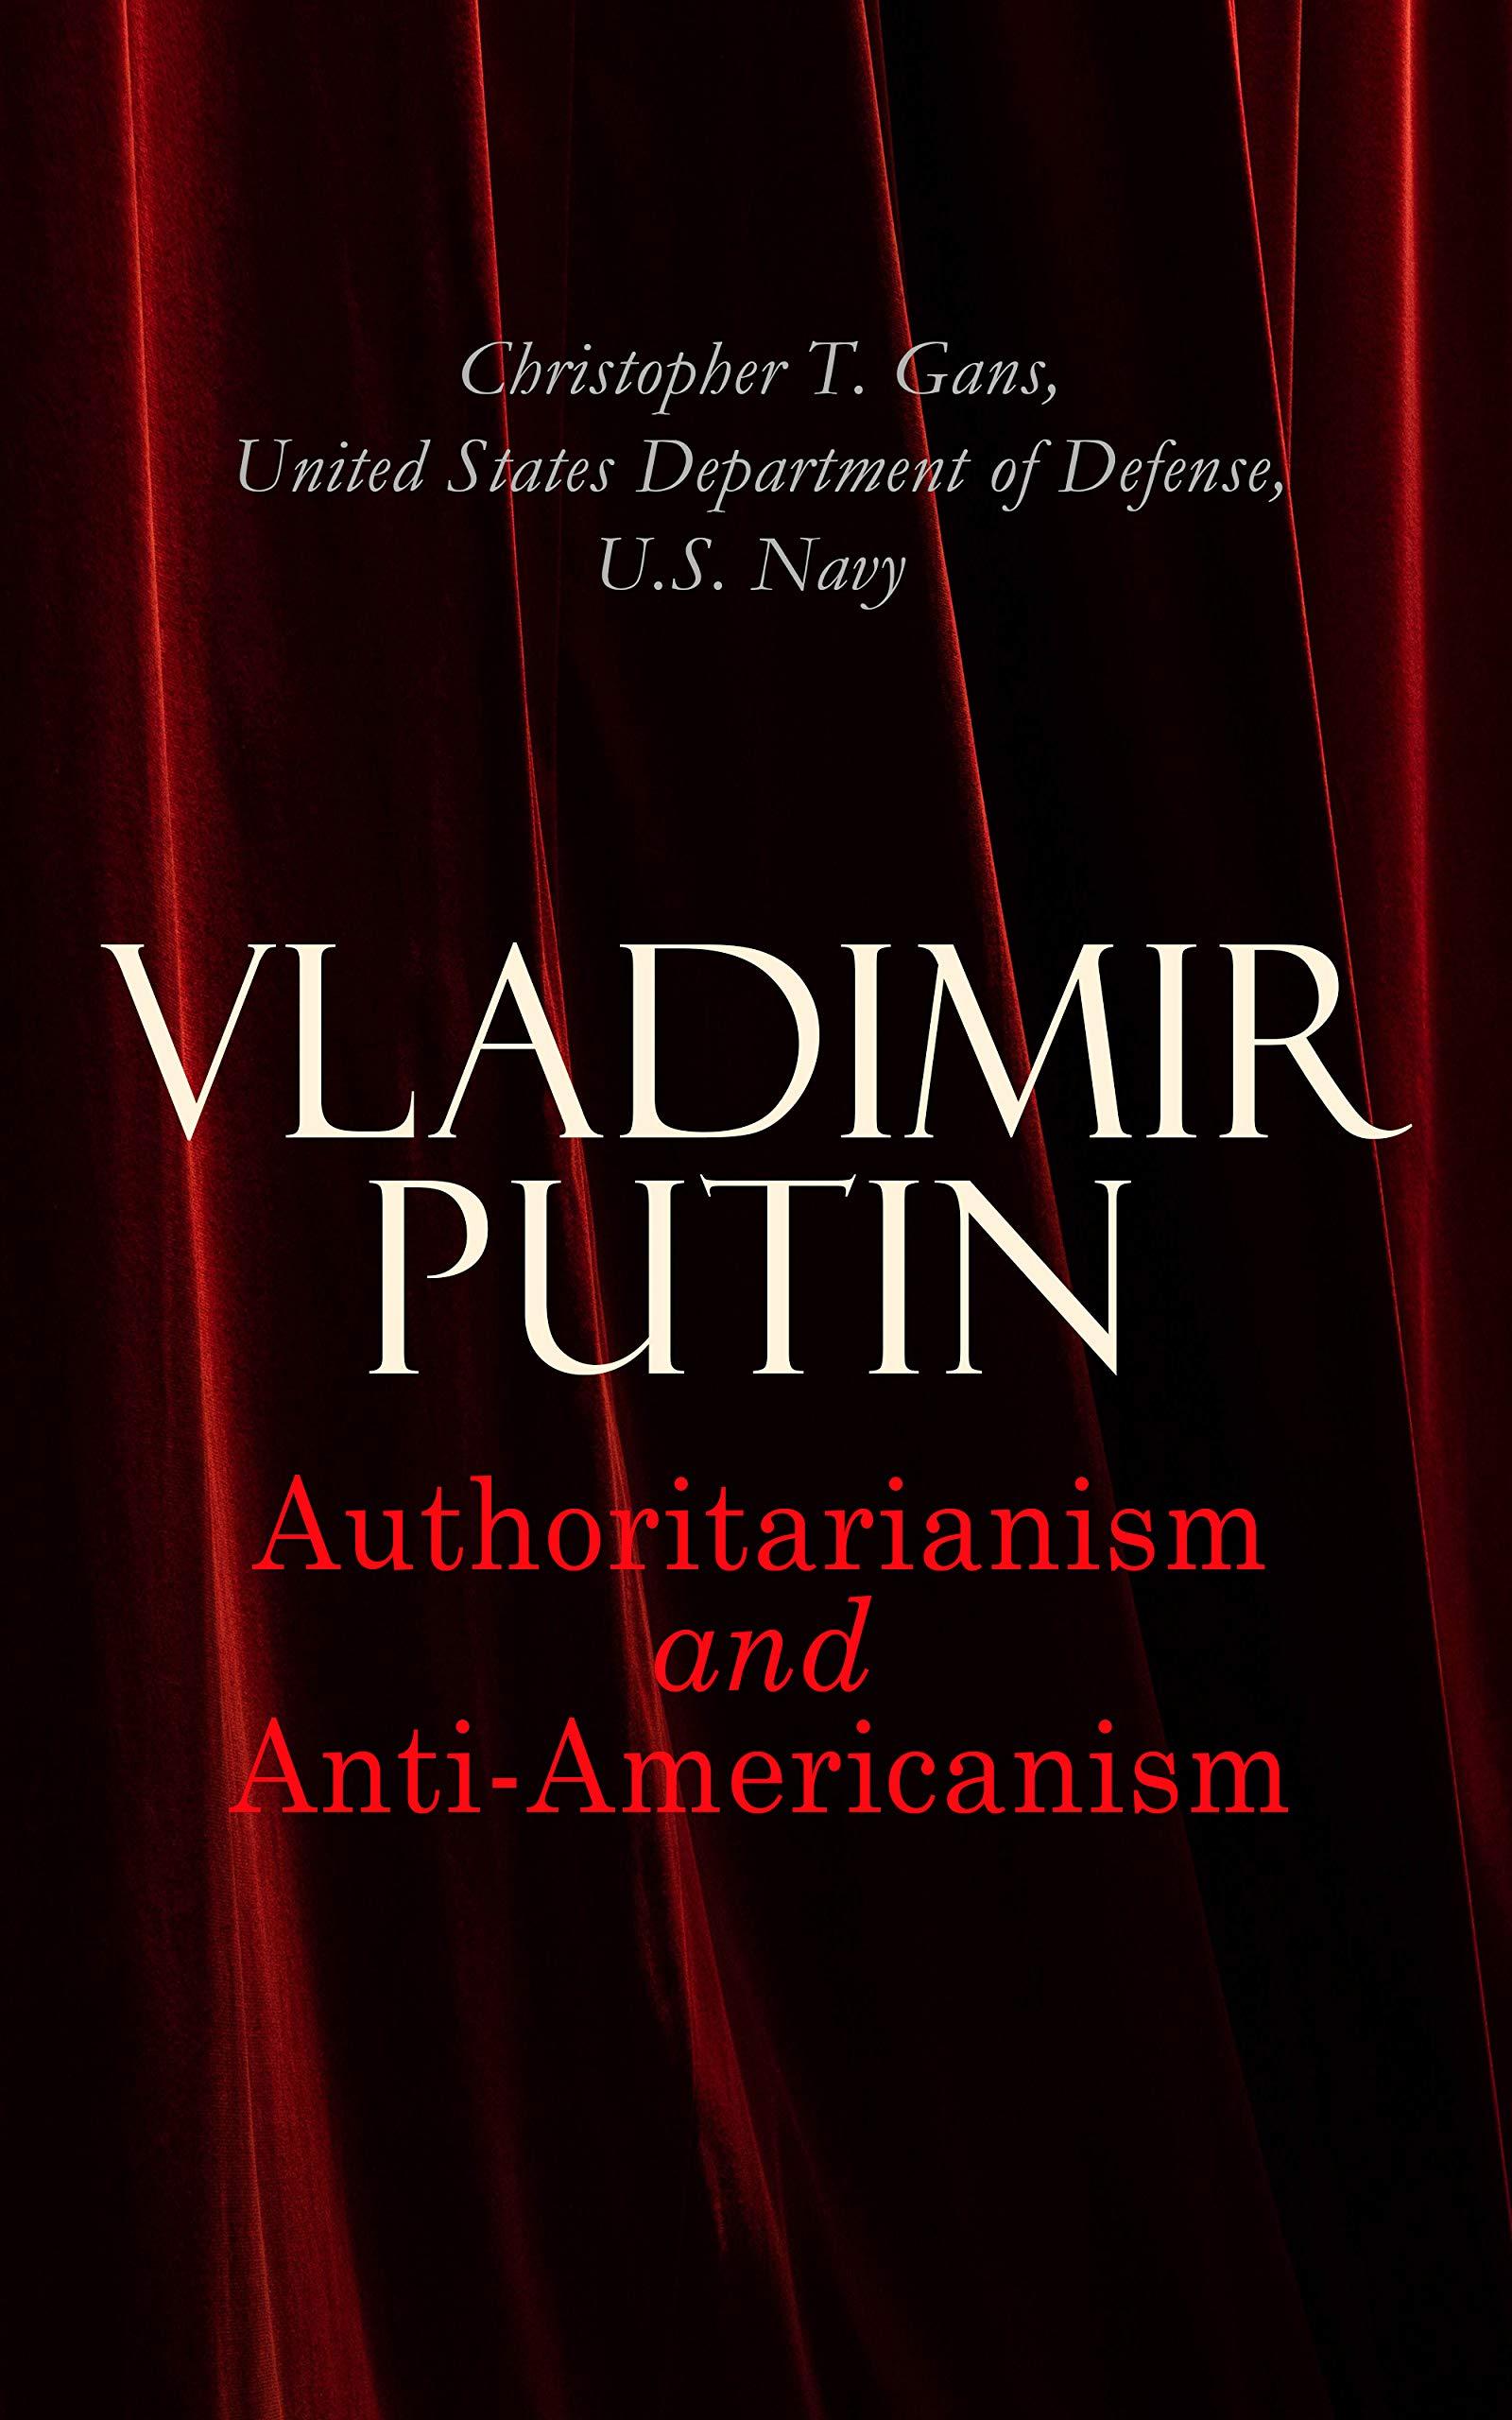 Vladimir Putin: Authoritarianism and Anti-Americanism